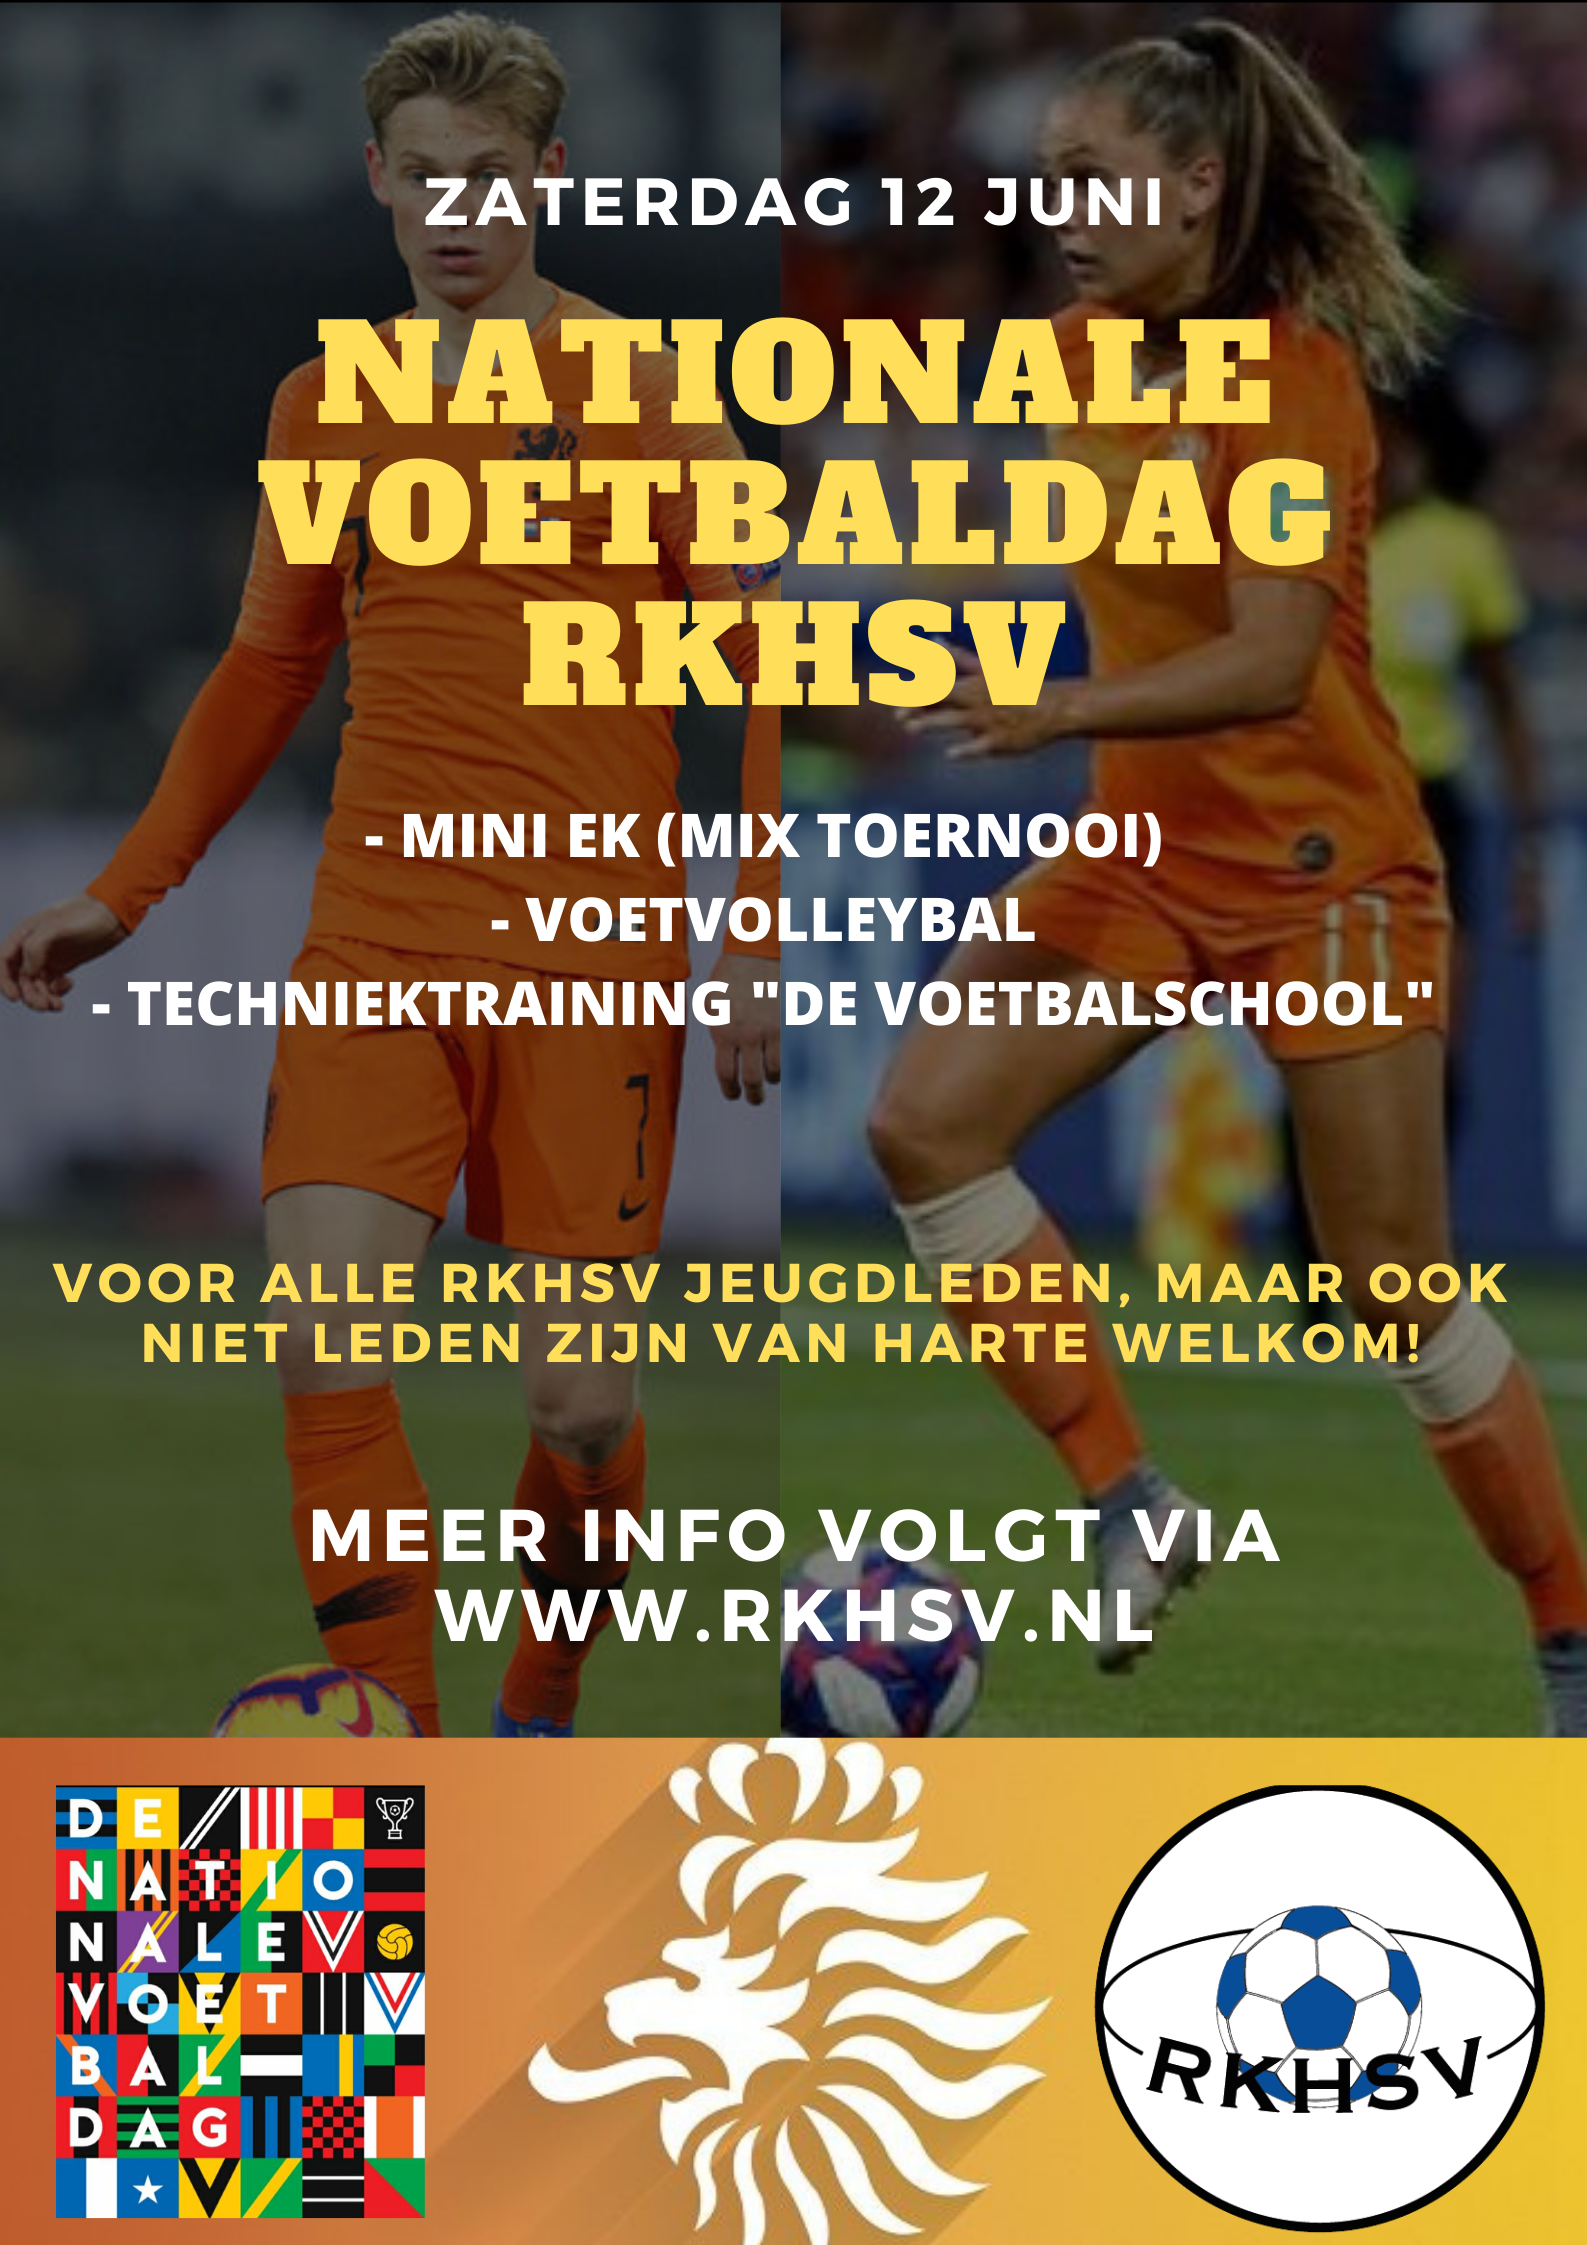 Nationale Voetbaldag RKHSV